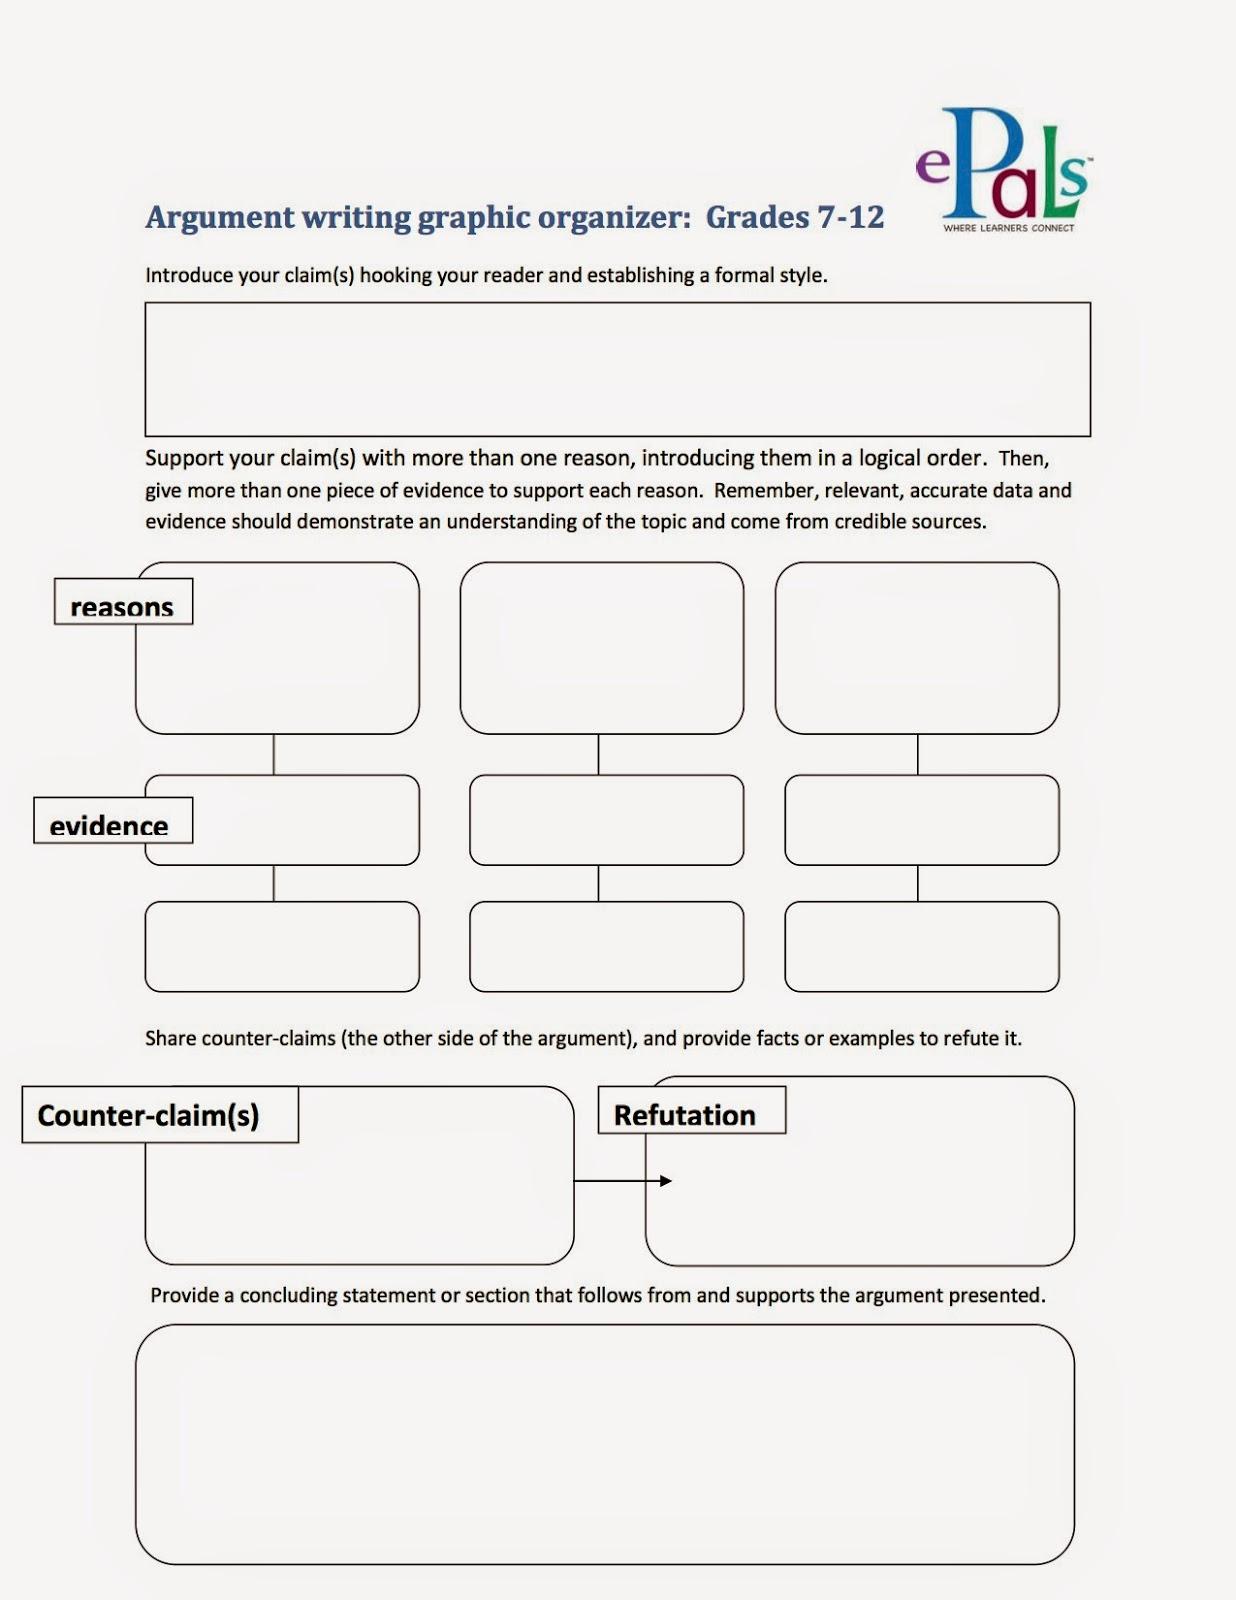 005 Argumentgraphicorganizer2bcopy Argument Essay Graphic Organizer Breathtaking Argumentative College Example Persuasive Template